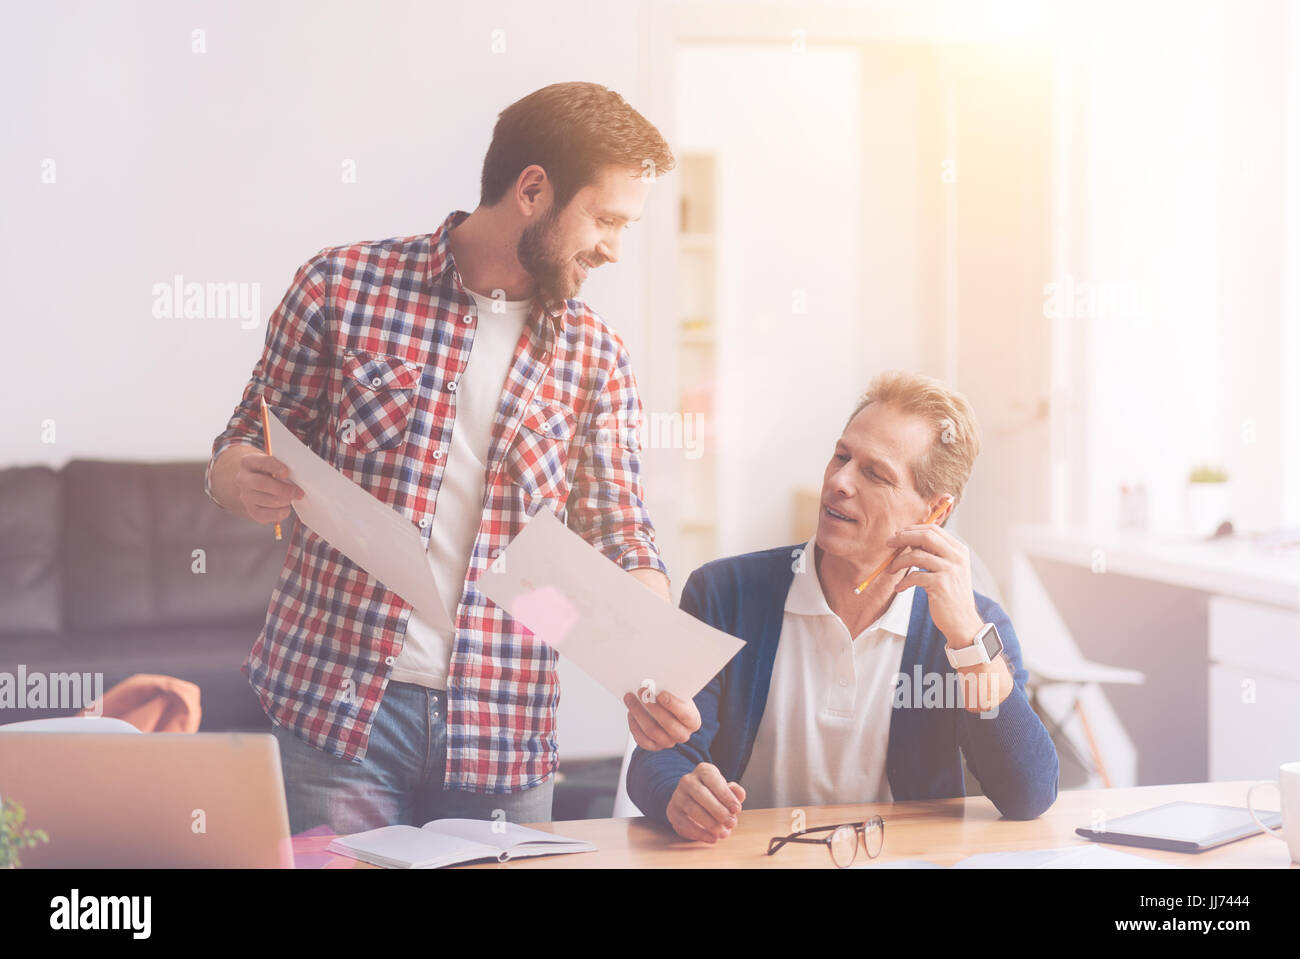 Positive Kollegen helfen einander im Büro Stockbild